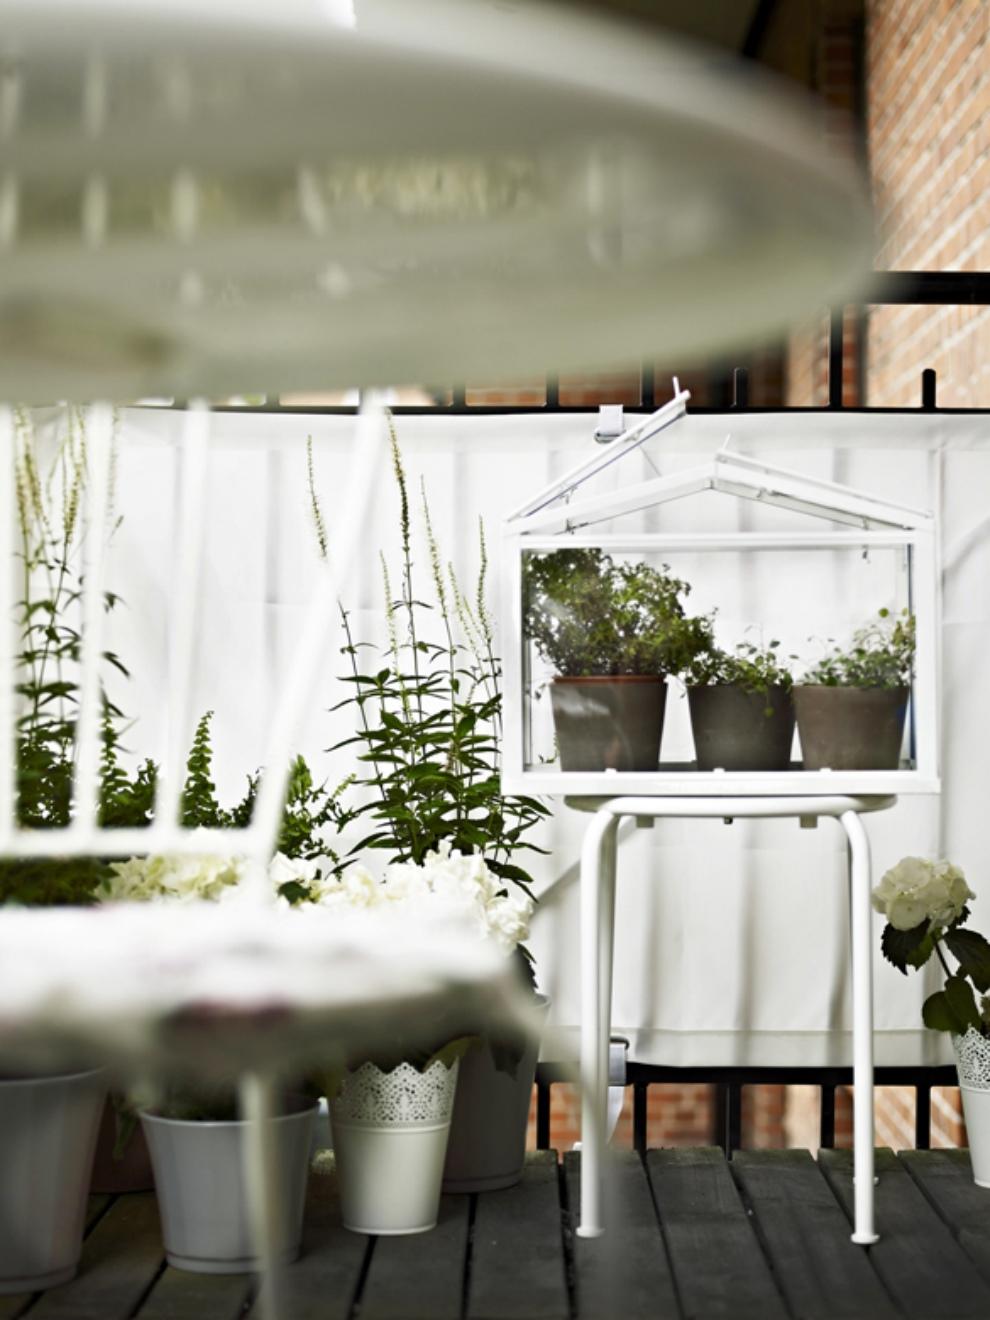 Muebles ikea exterior 55 revista muebles mobiliario de for Muebles de almacenaje para exterior